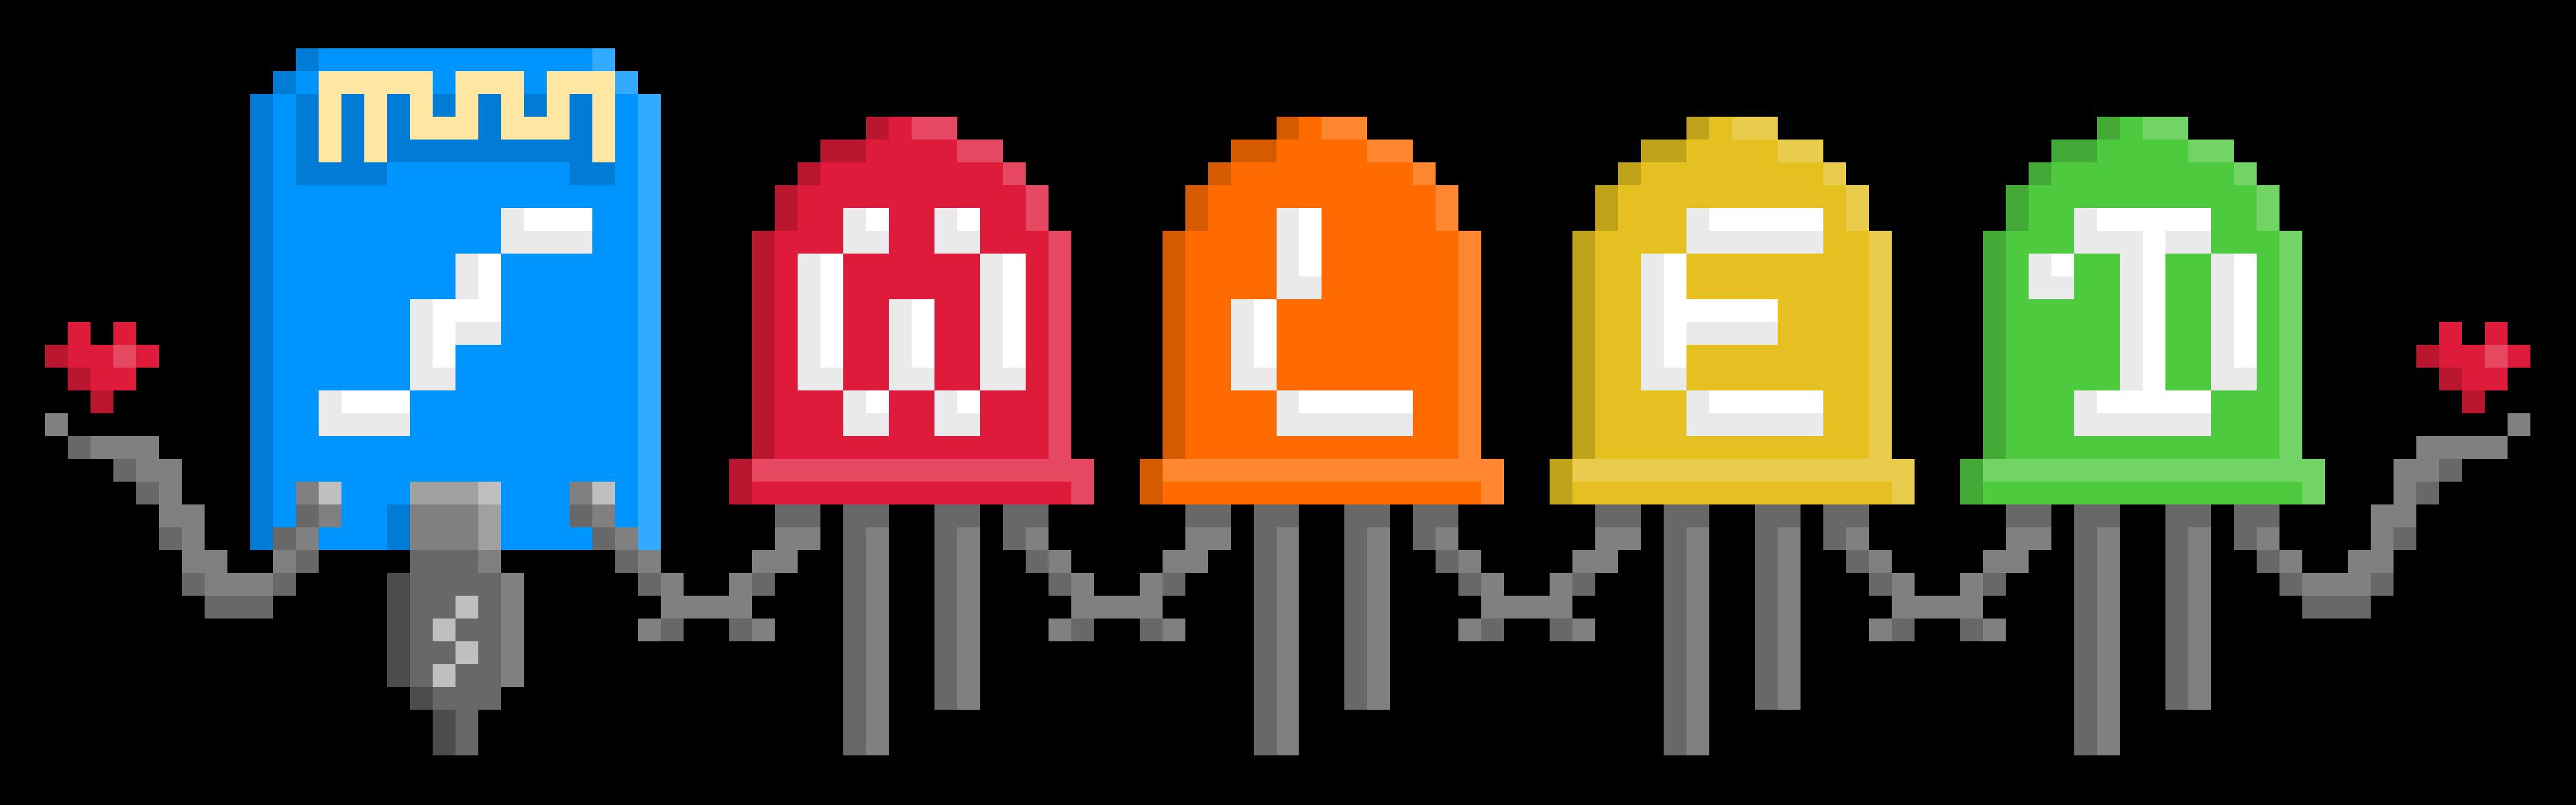 WLED, software for LED strips